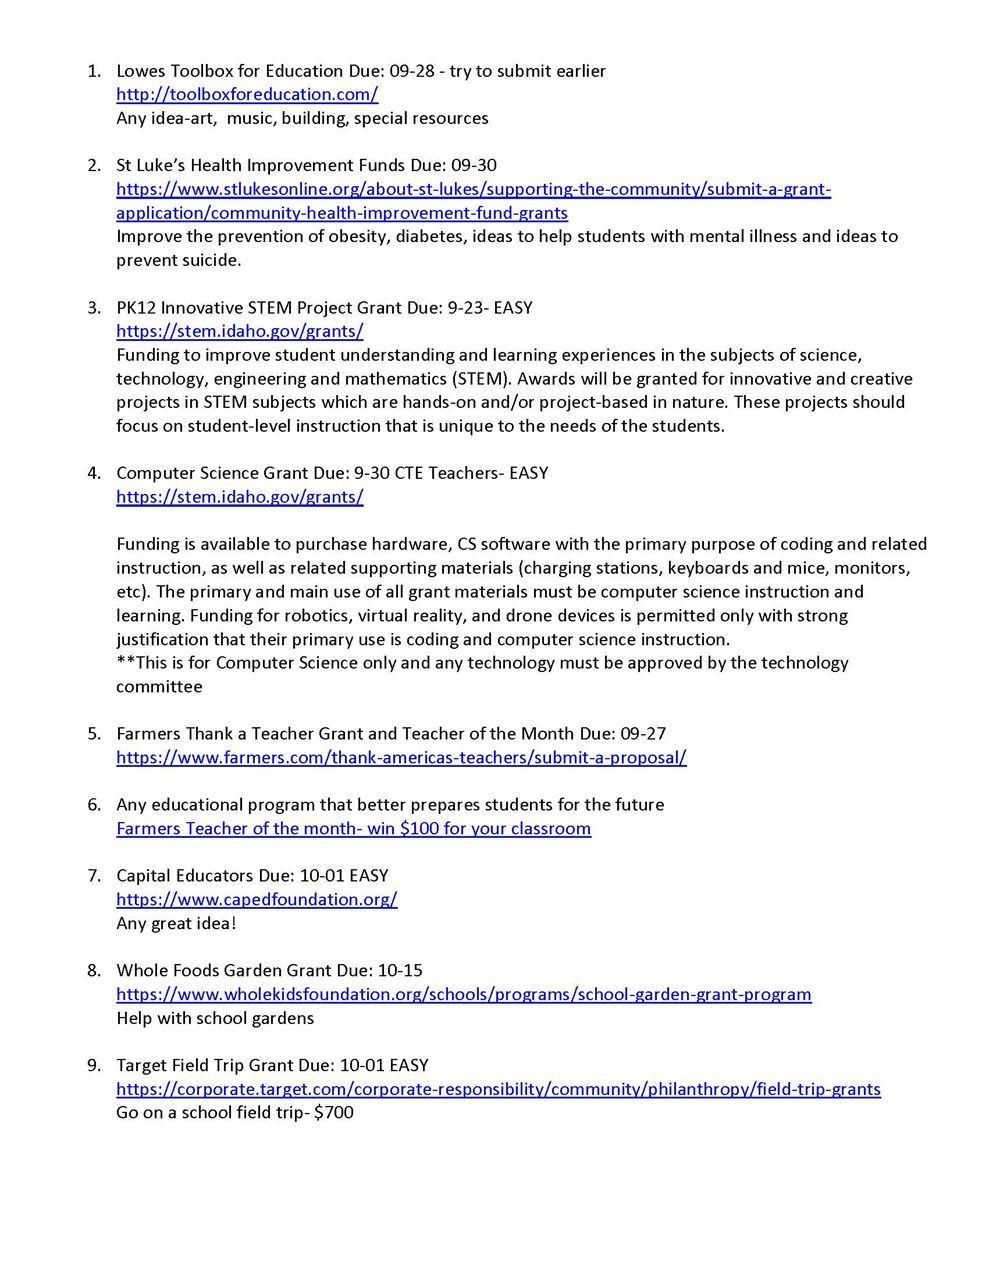 idaho council of teachers of mathematics grant opportunities